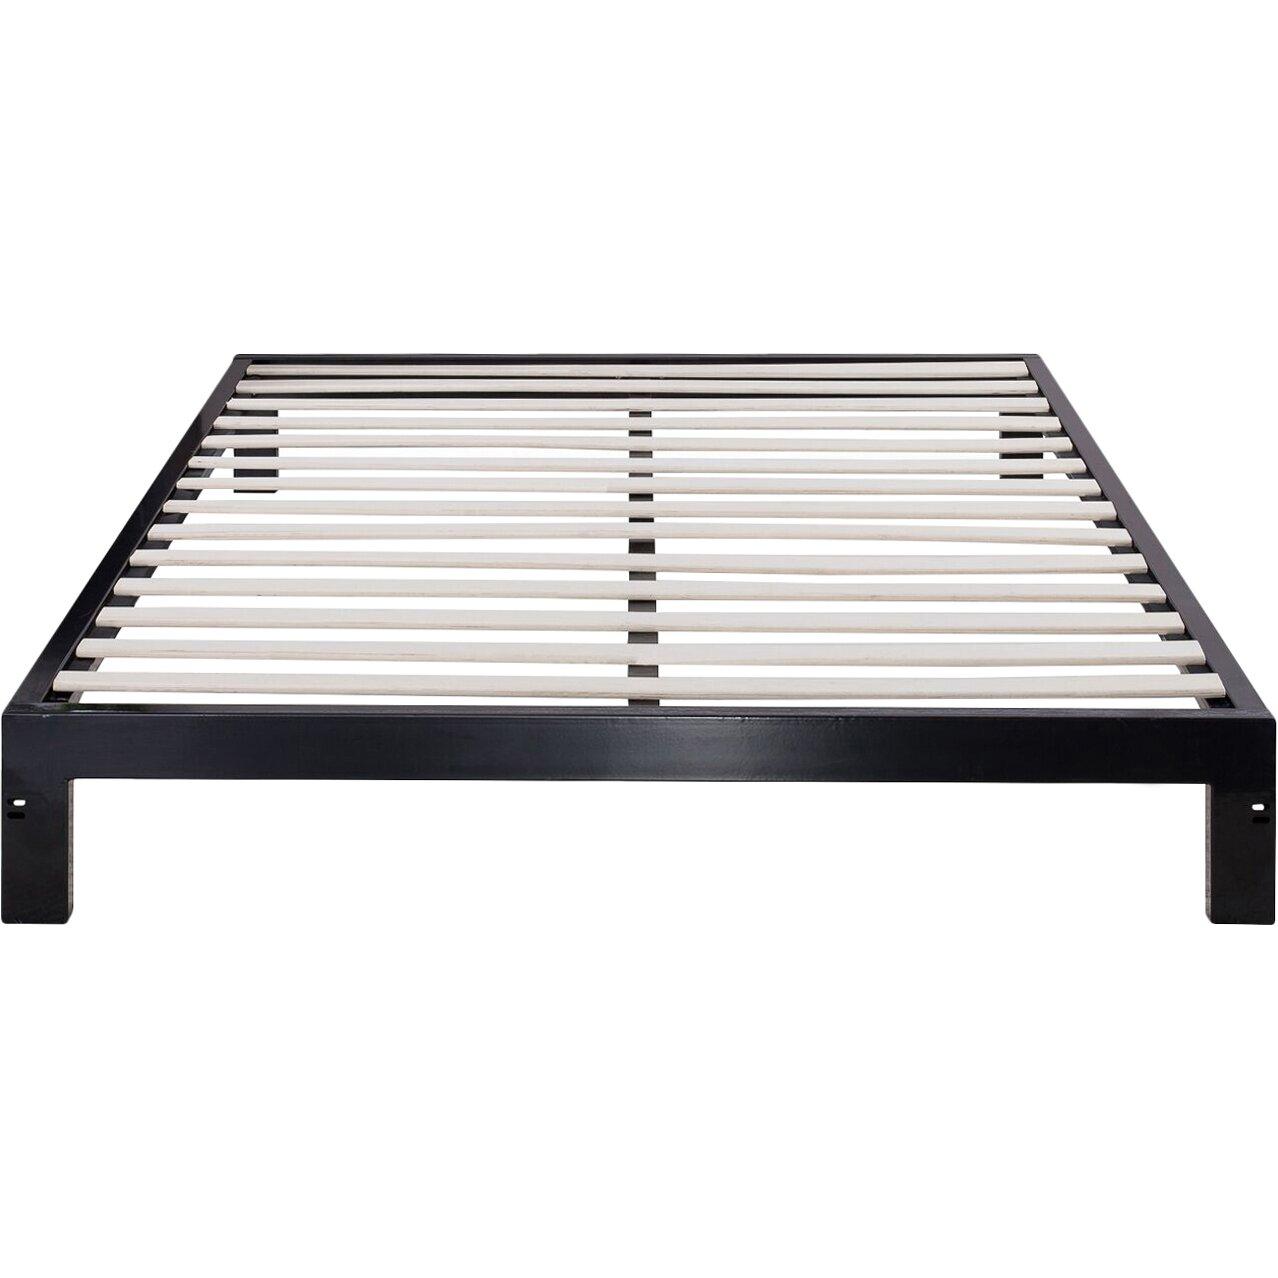 Orthotherapy zinus platform metal 2000 bed frame mattress foundation